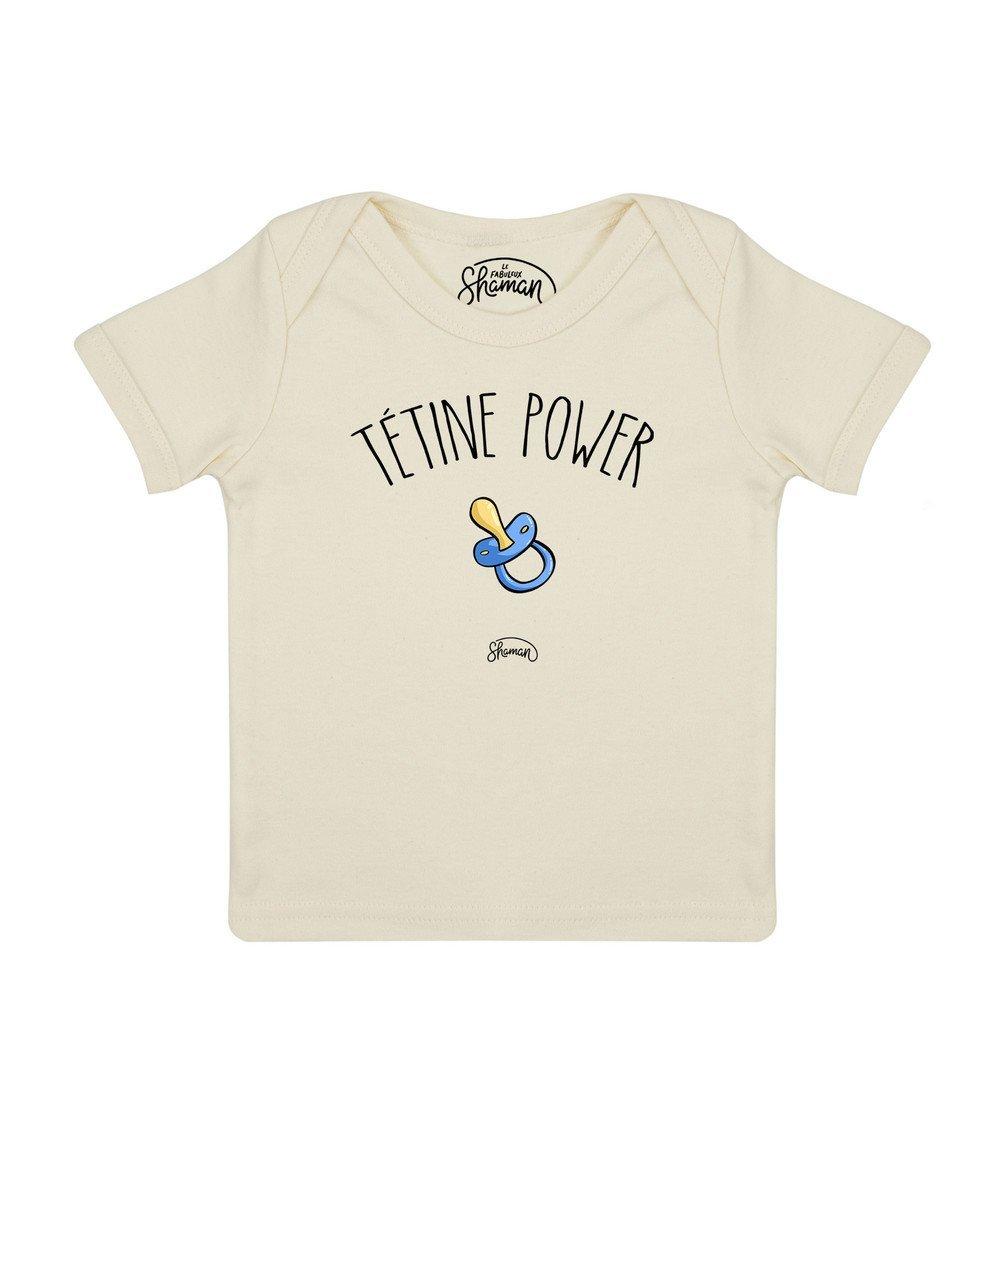 Tee shirt Tétine power